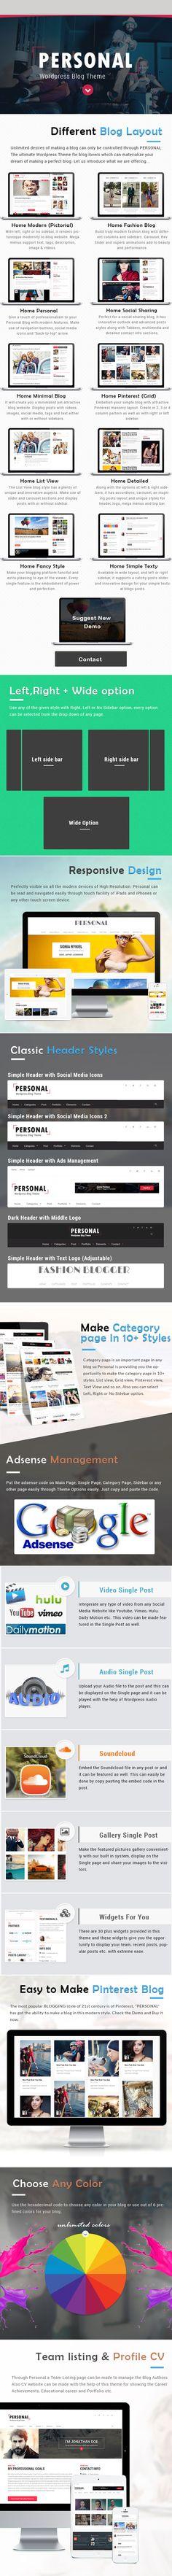 Personal – Best Blog, CV and Video WordPress Theme